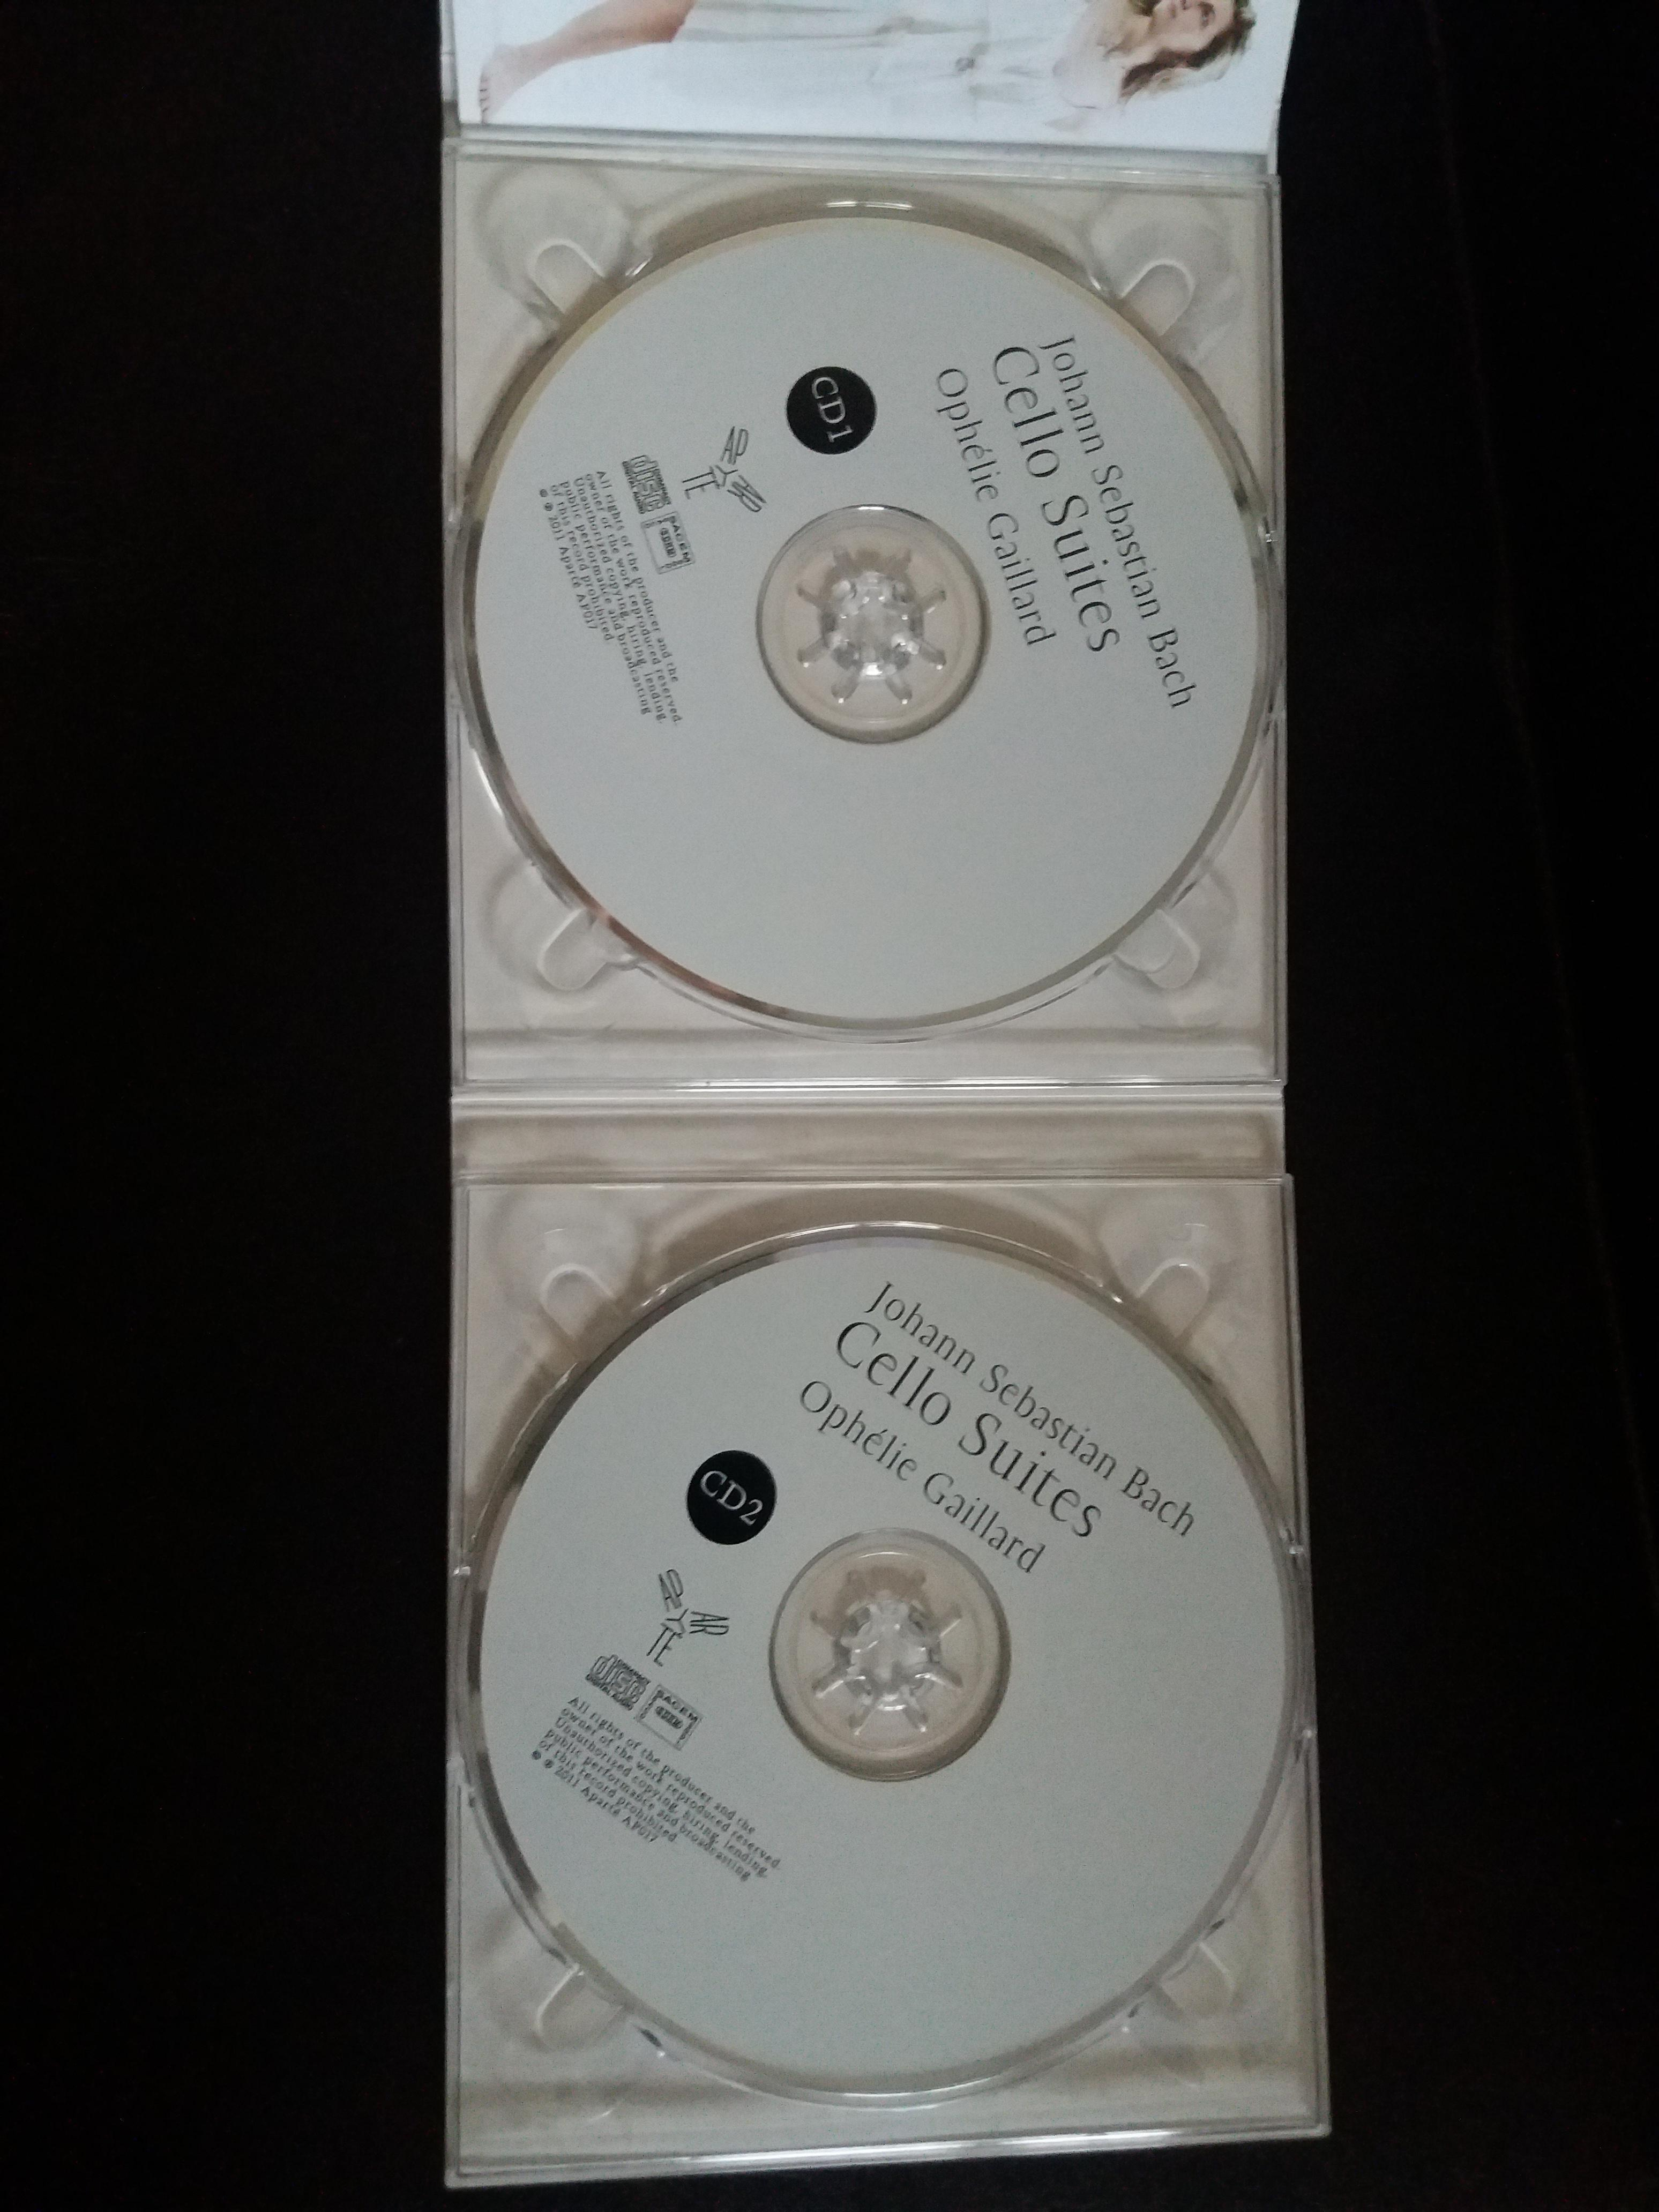 troc de troc cd bach   par ophélie gaillard  neuf image 1